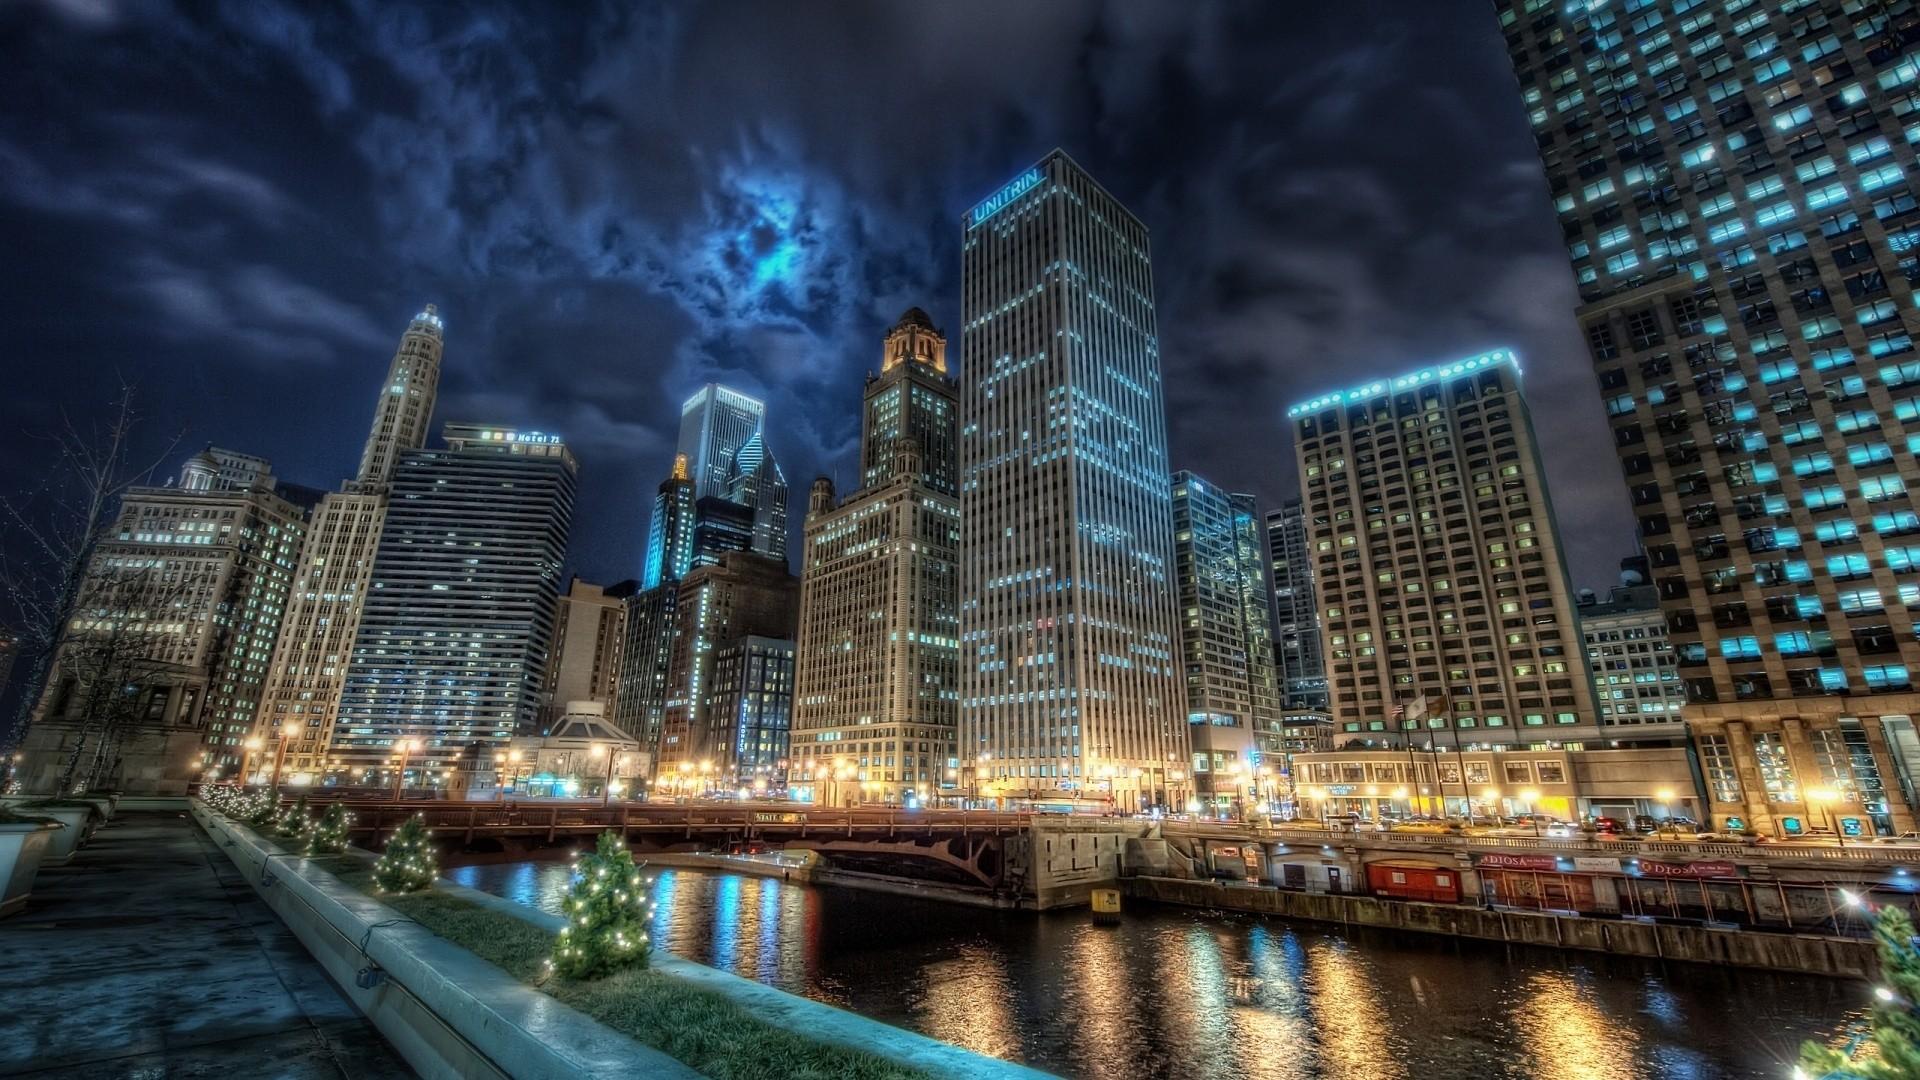 HD City Desktop Backgrounds | Desktop Image